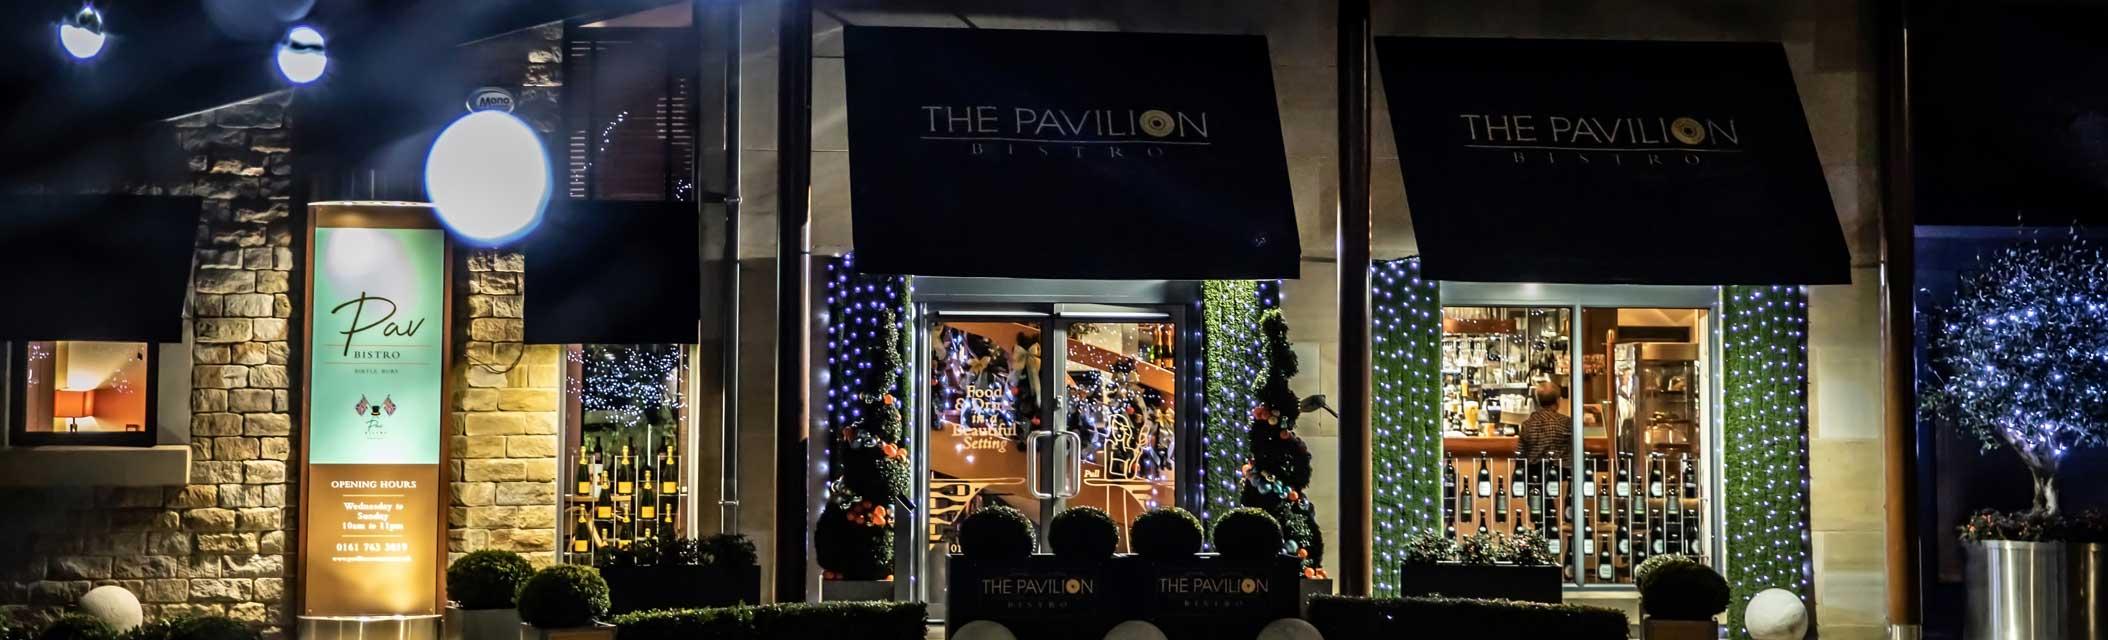 The Pavilion Bistro, Birtle, Bury